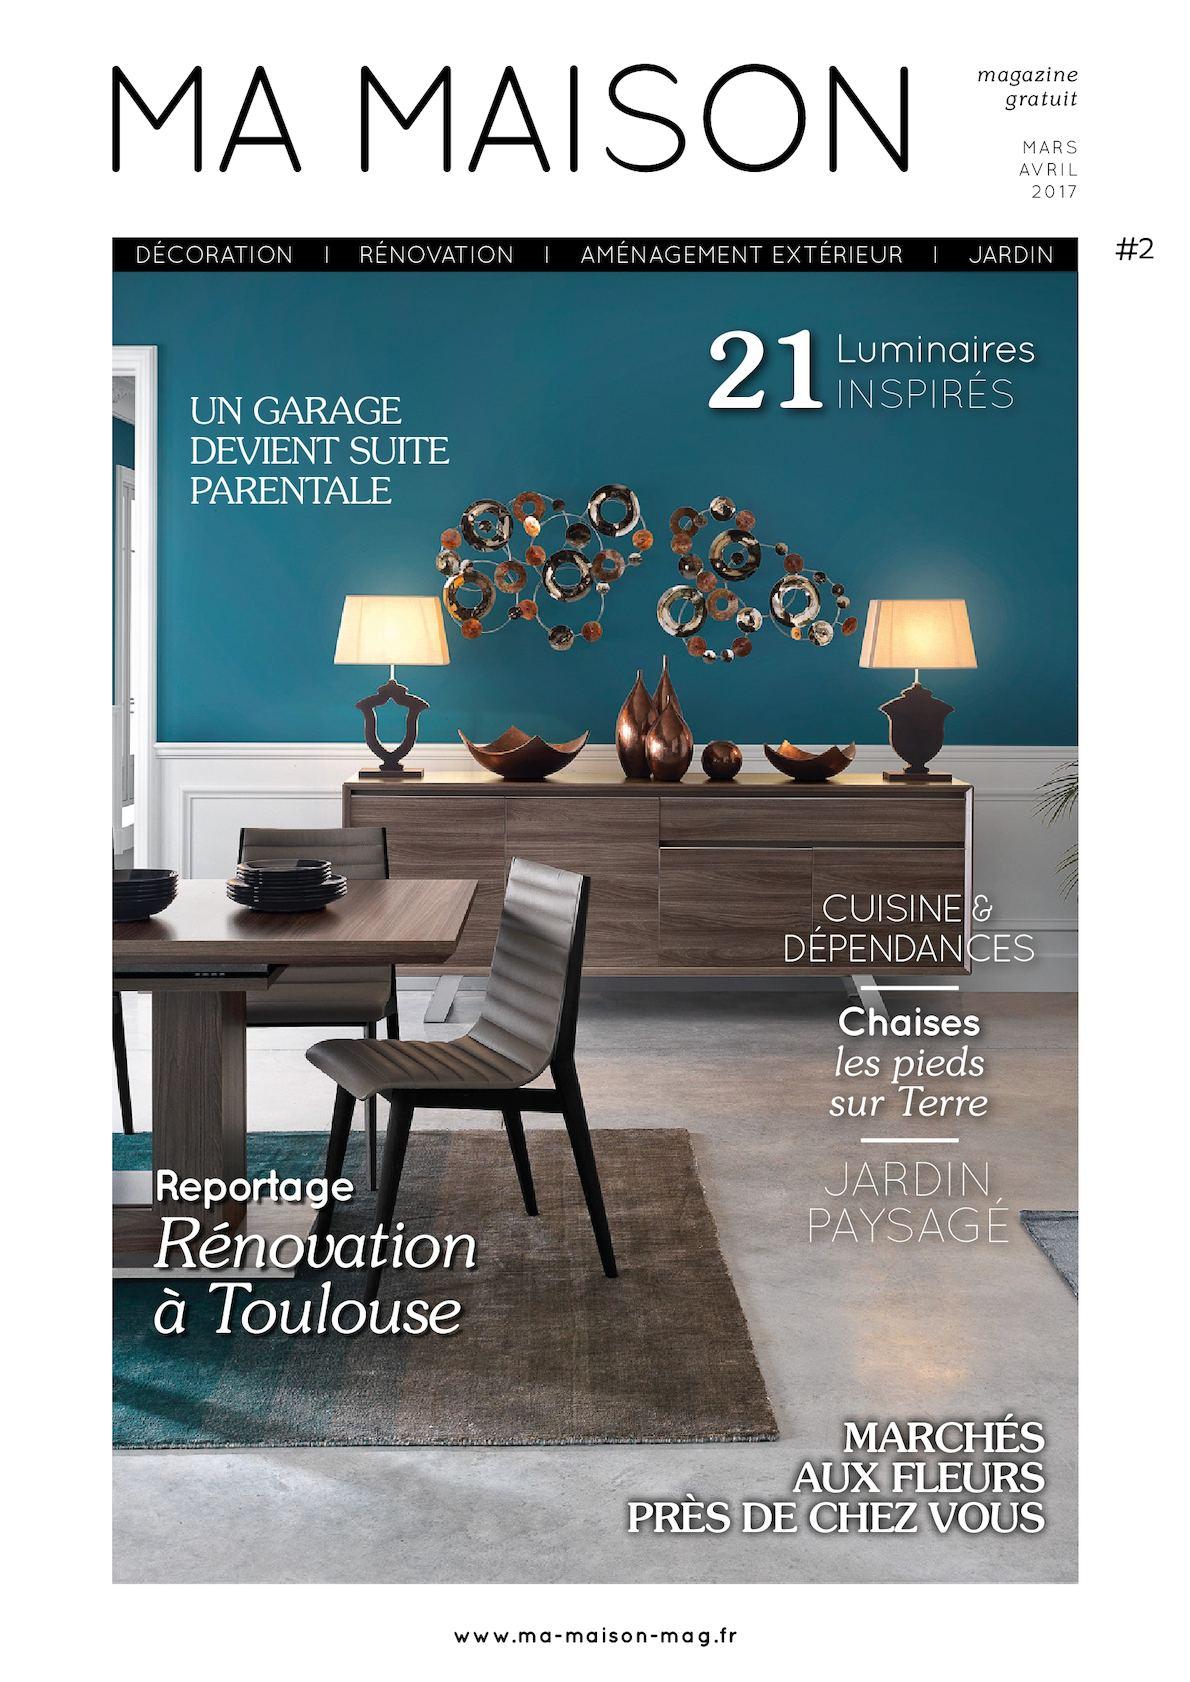 Socoo C Portet Sur Garonne calaméo - ma maison magazine gratuit numero 2